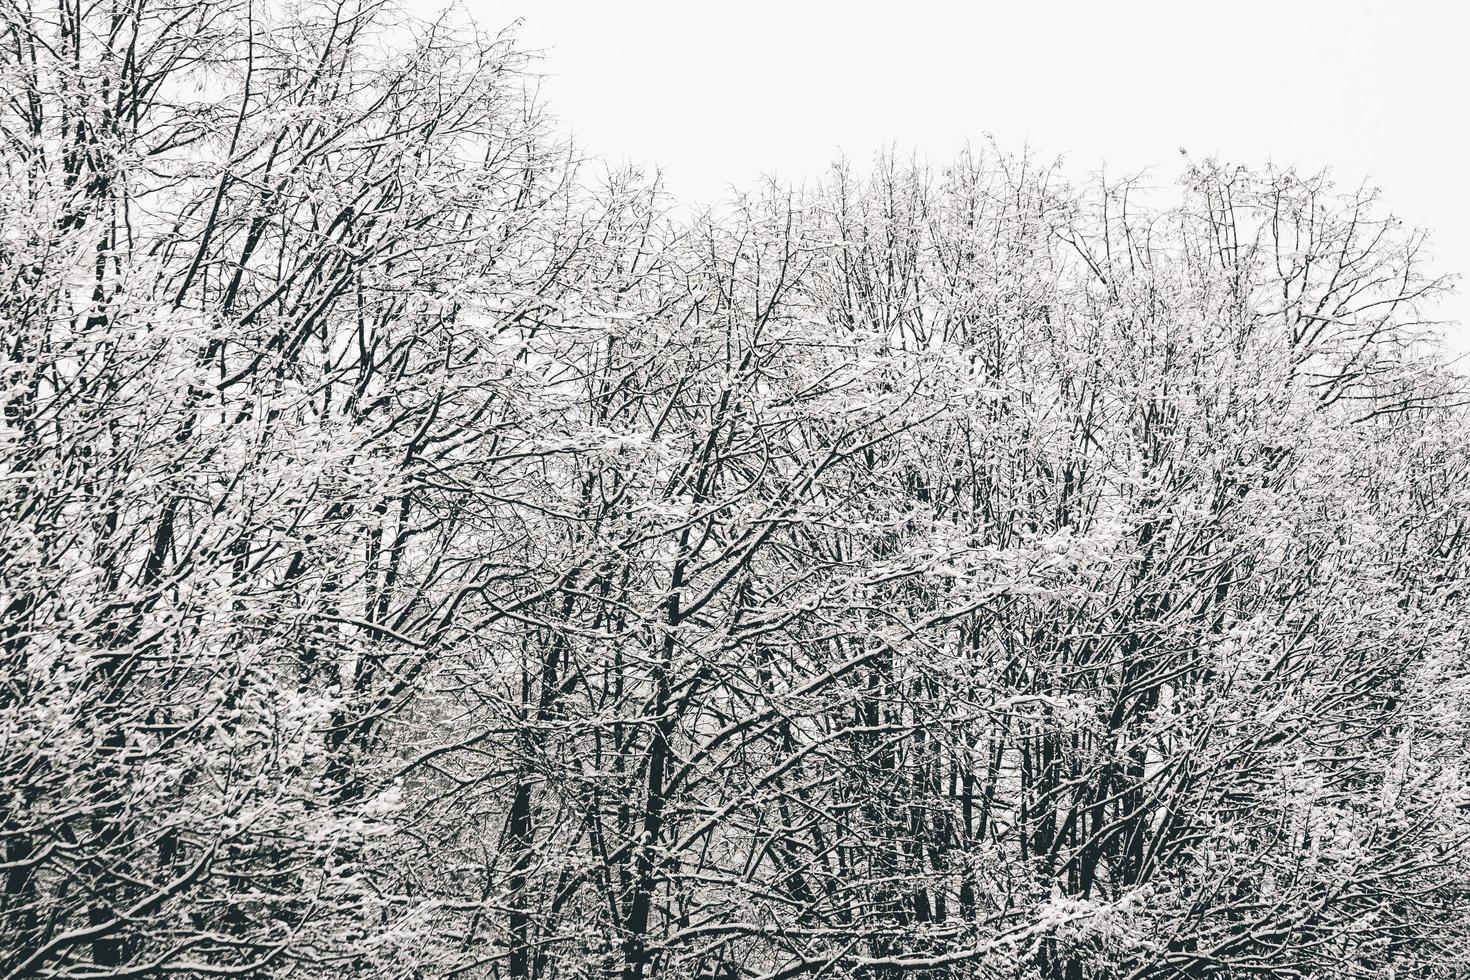 alberi spogli coperti di neve foto